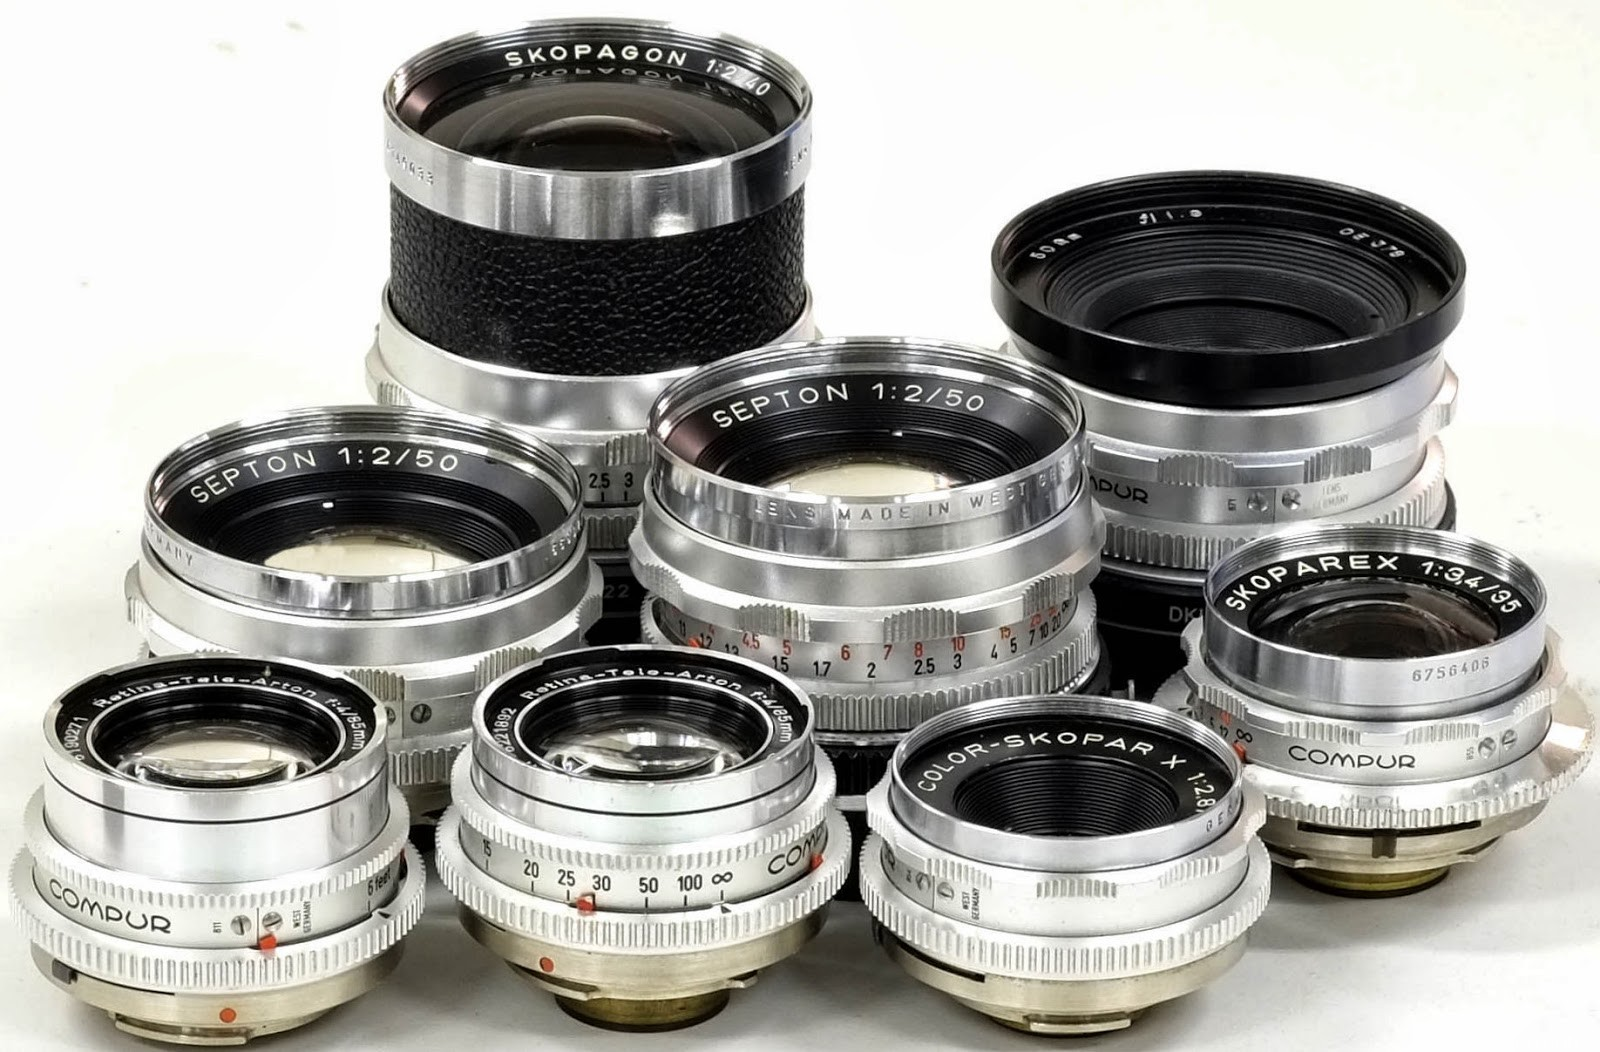 盘点常见DKL镜头 Deckel mount lenses镜头专题